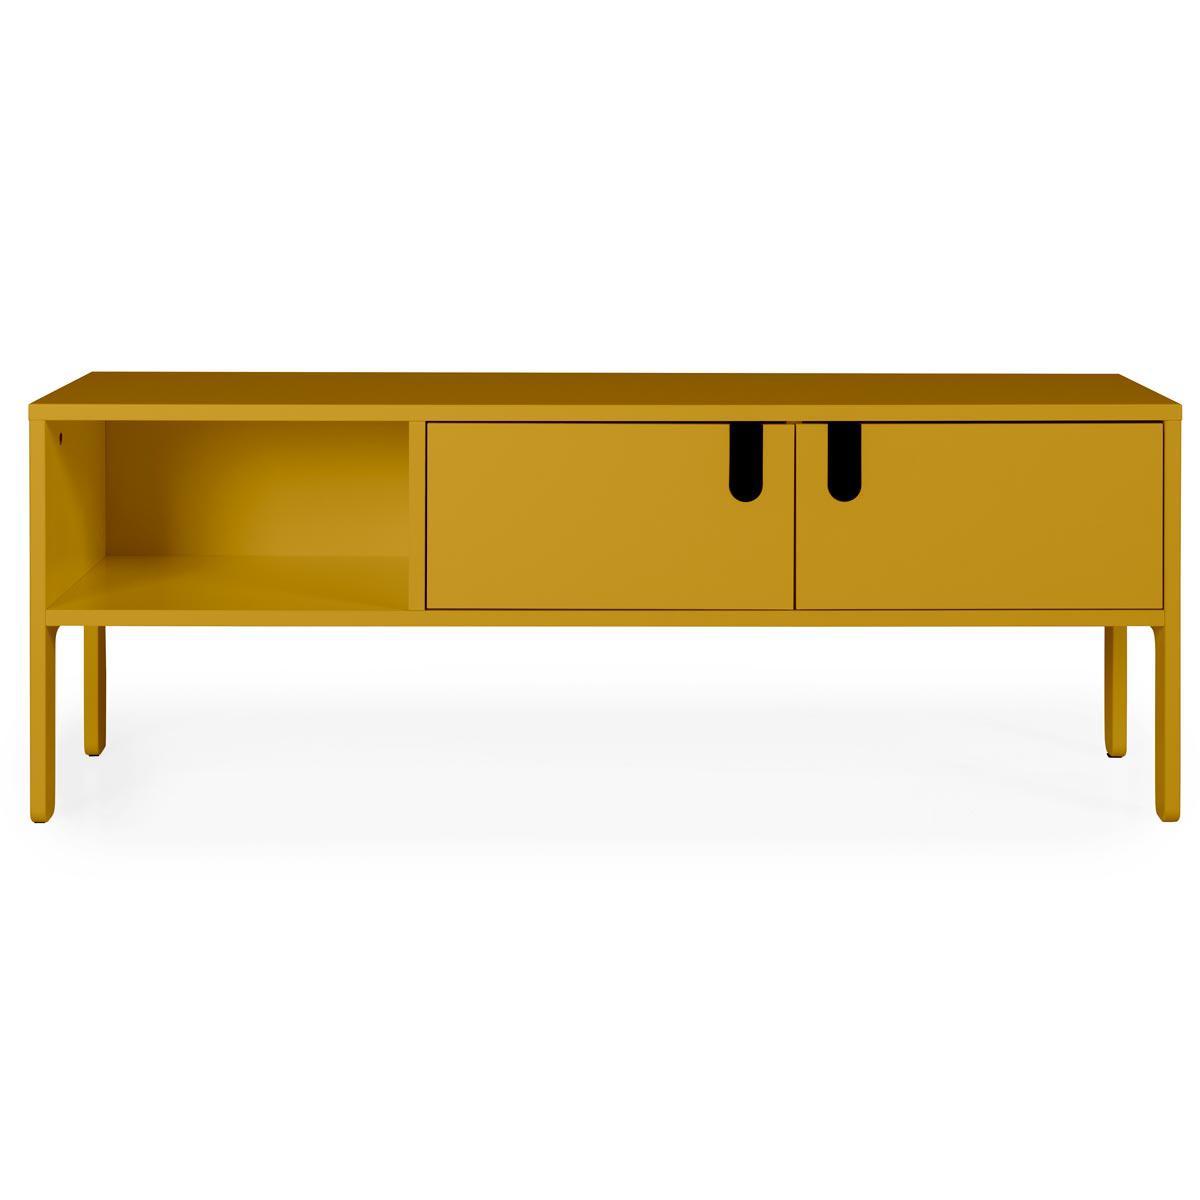 Quelle Hauteur Meuble Tv abitare-living.lu   meuble tv uno tenzo 137cm moutarde